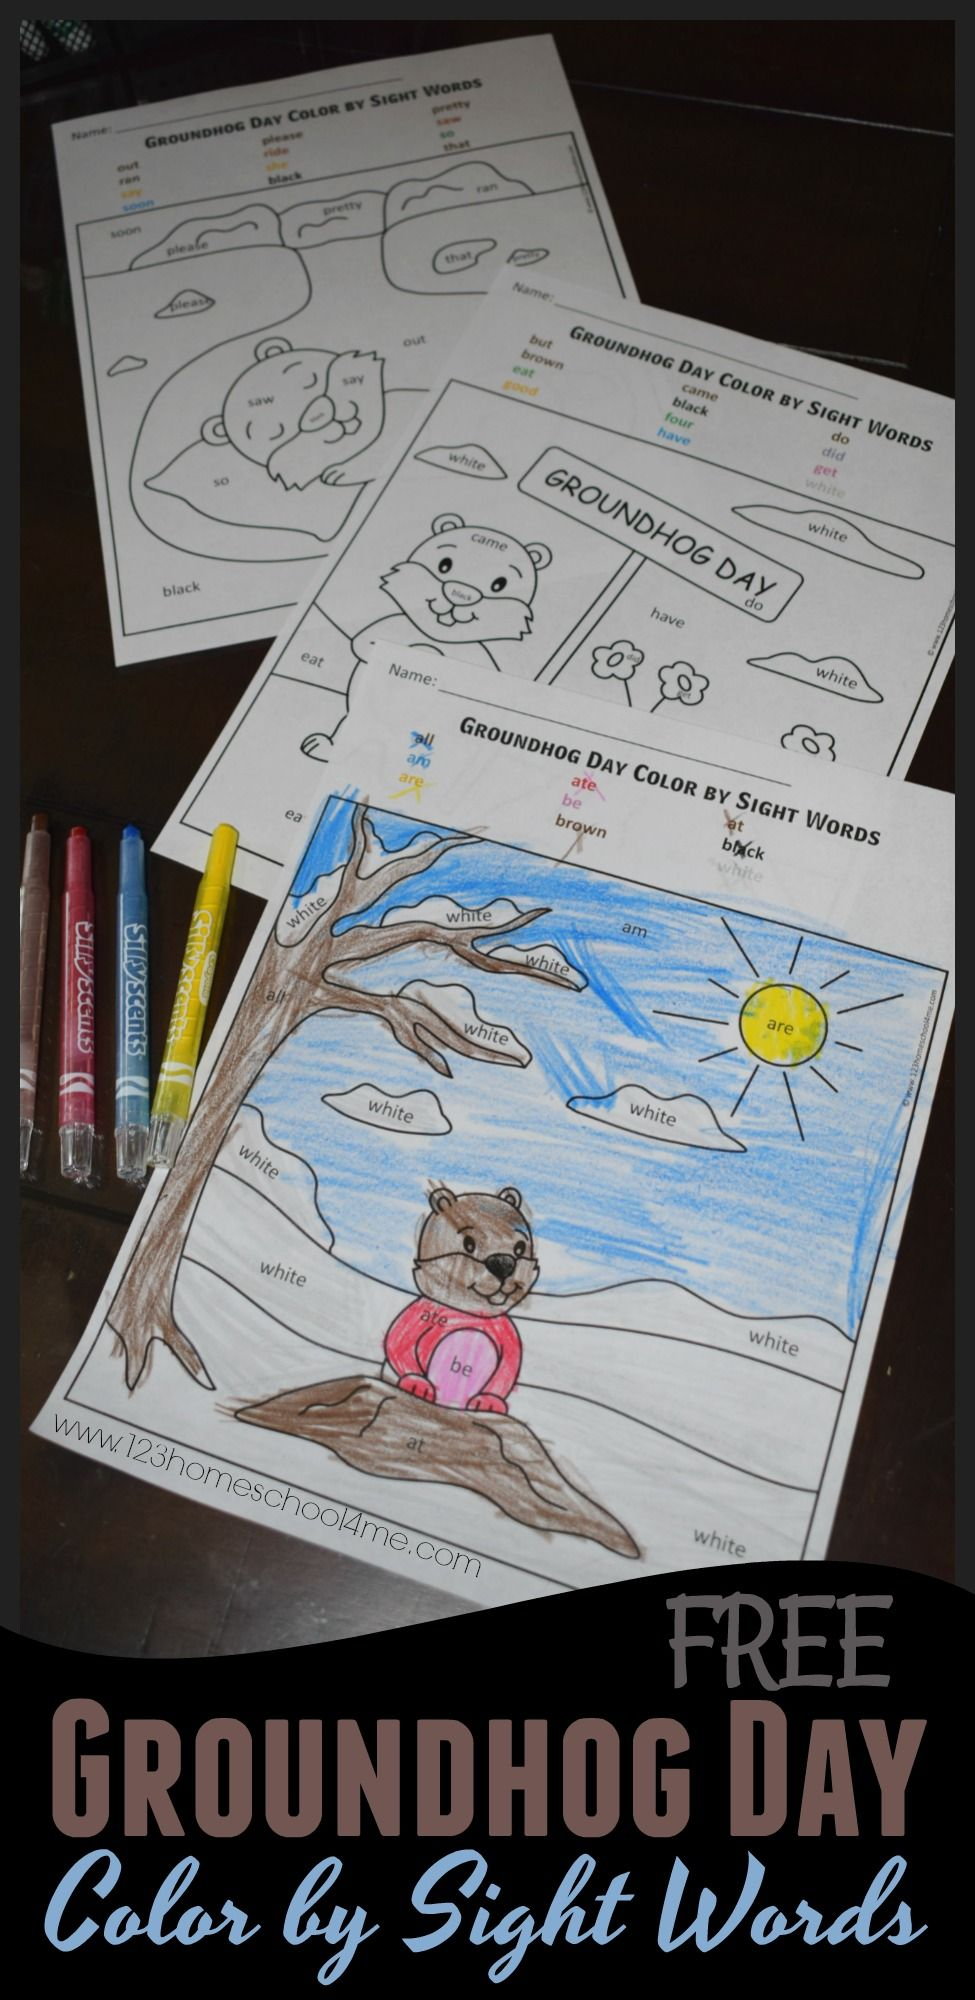 123 Homeschool 4 Me | 123 Homeschool 4 Me ☺ | Pinterest ...